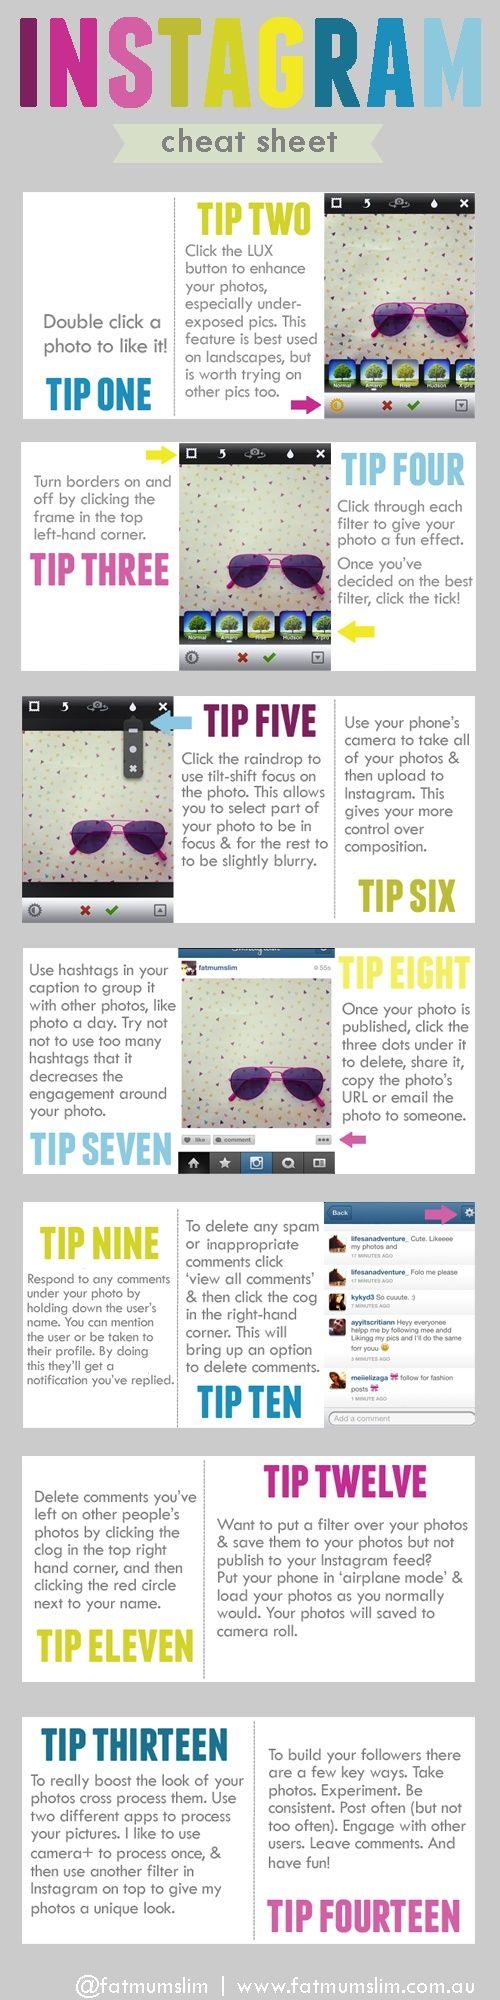 Instagram Tips   #instagram #socialmedia #tips   Agility Resources | Social Agility  www.AgilityResourcesInc.com